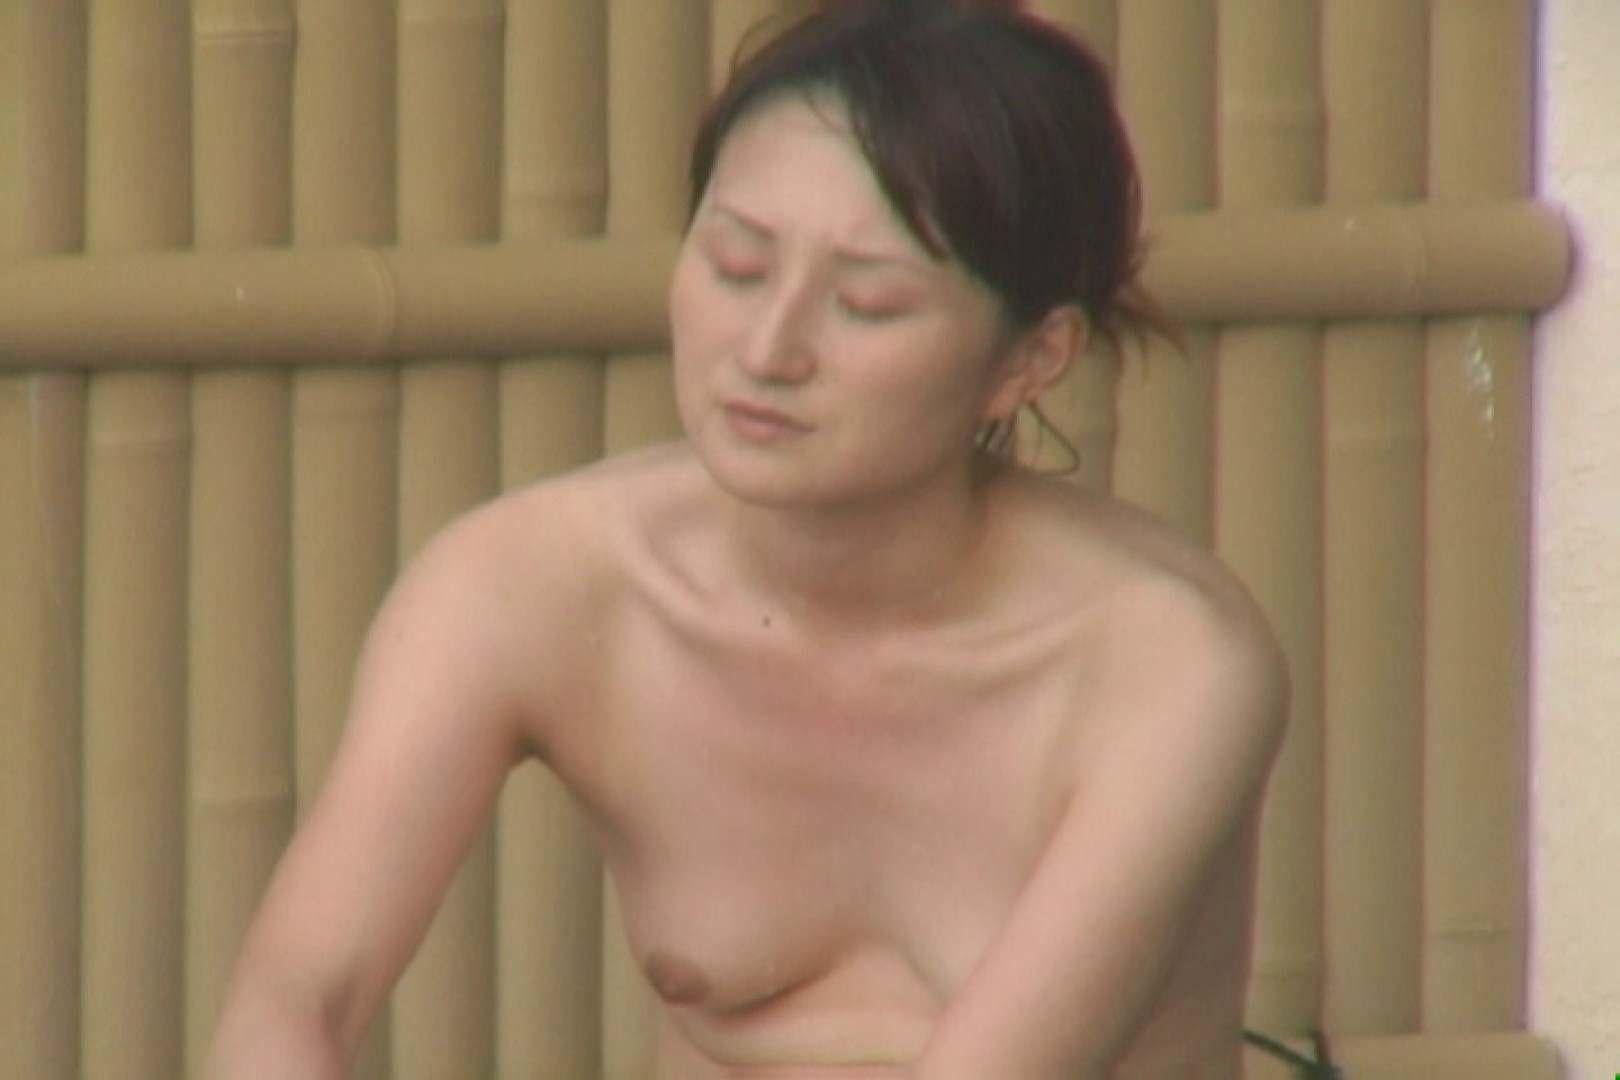 Aquaな露天風呂Vol.578 OL女体 われめAV動画紹介 77連発 38